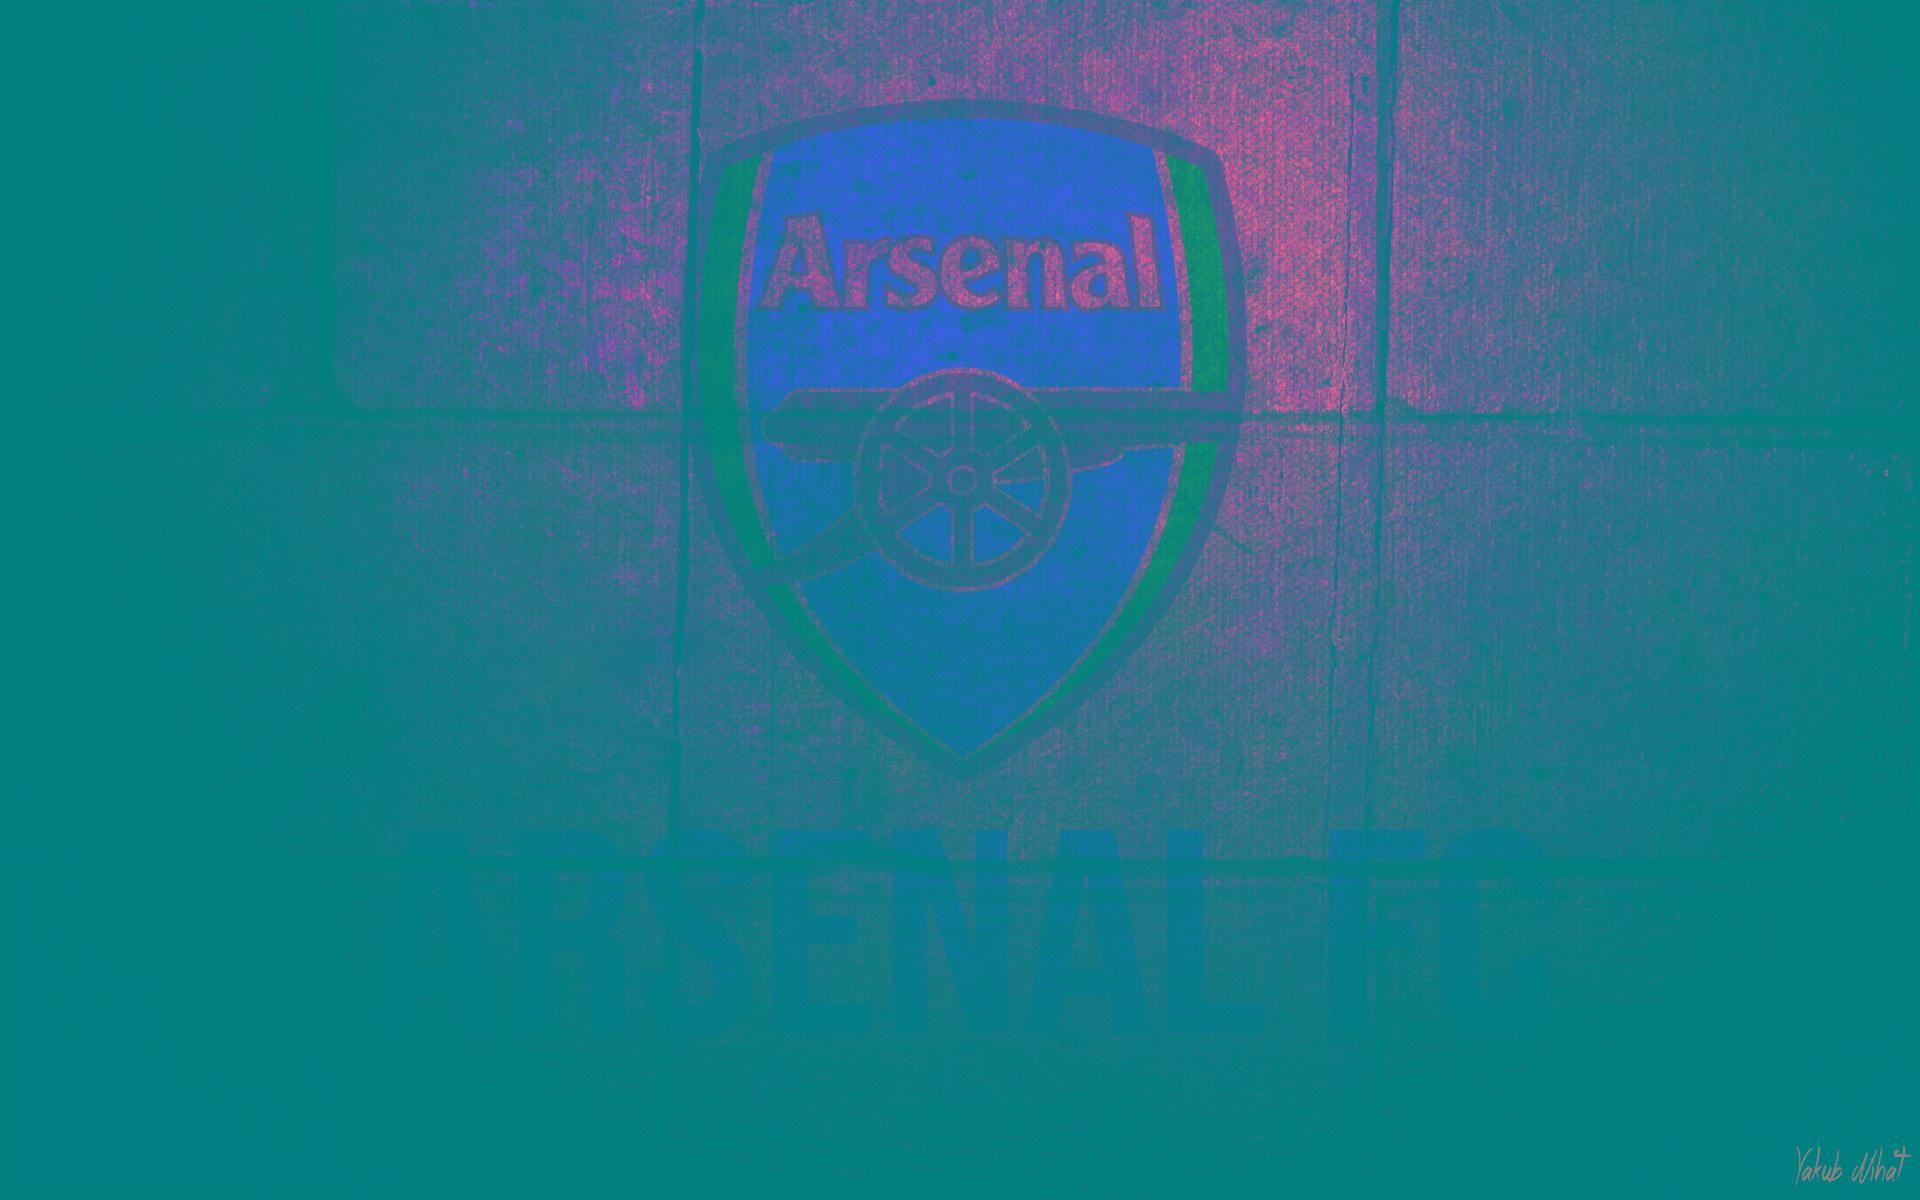 Arsenal Wallpaper Hd Emblem 131708 Hd Wallpaper